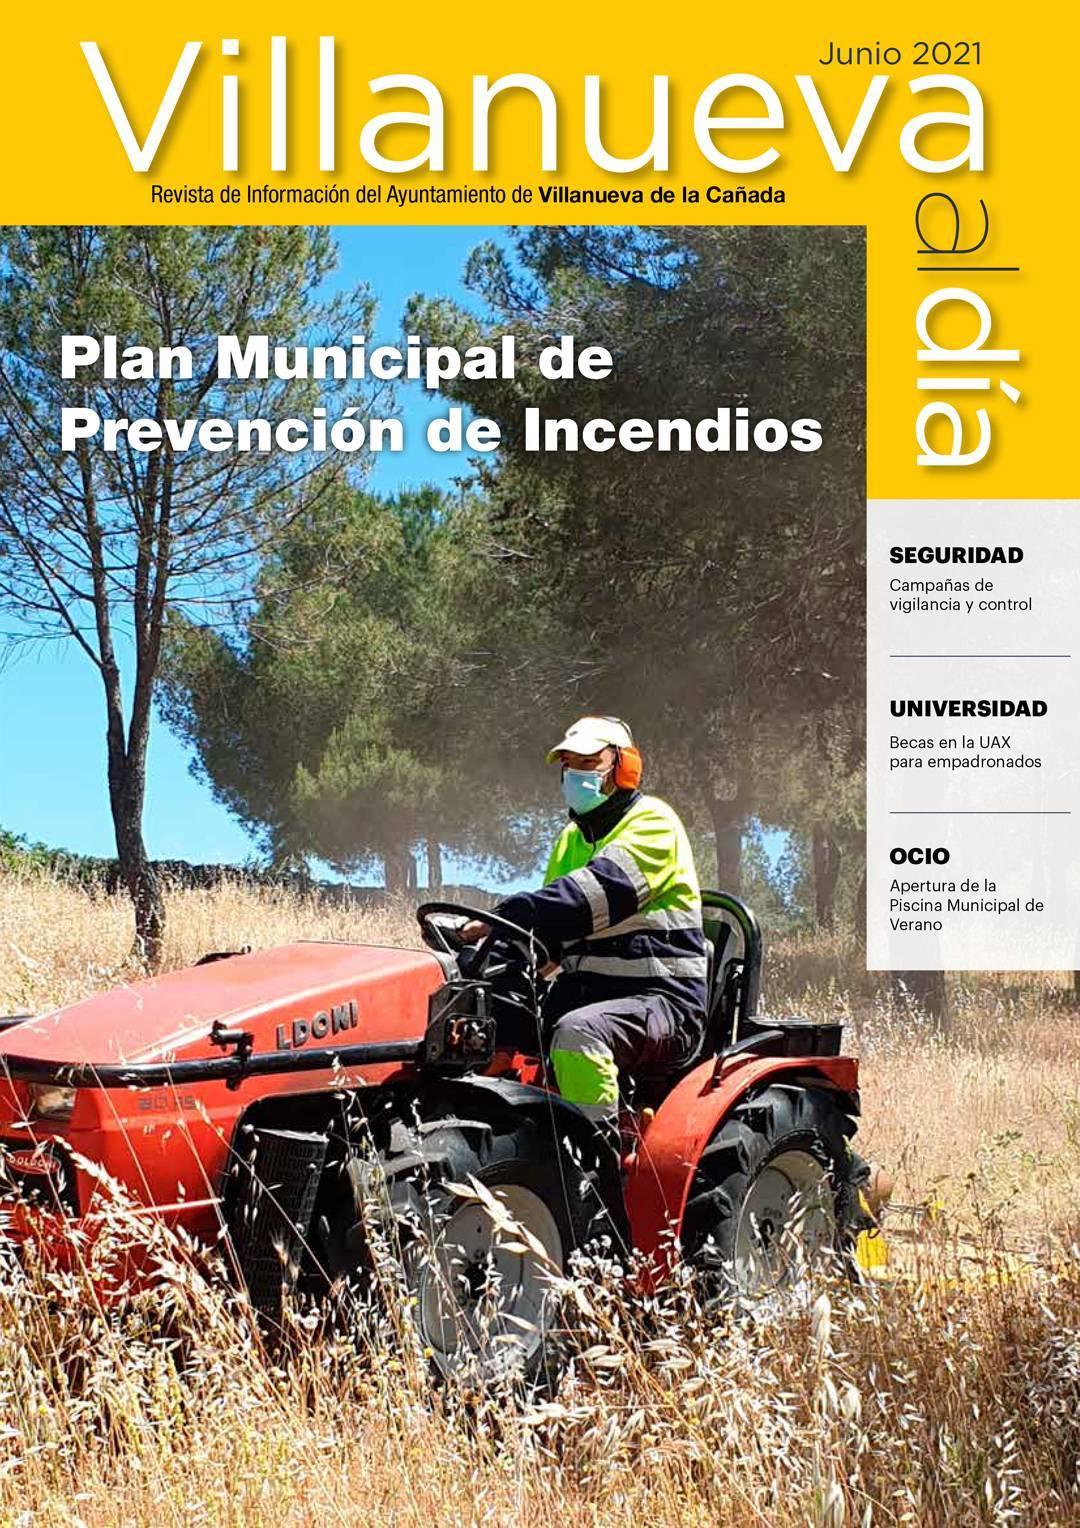 Revista-Villanueva-Junio-2021-Portada